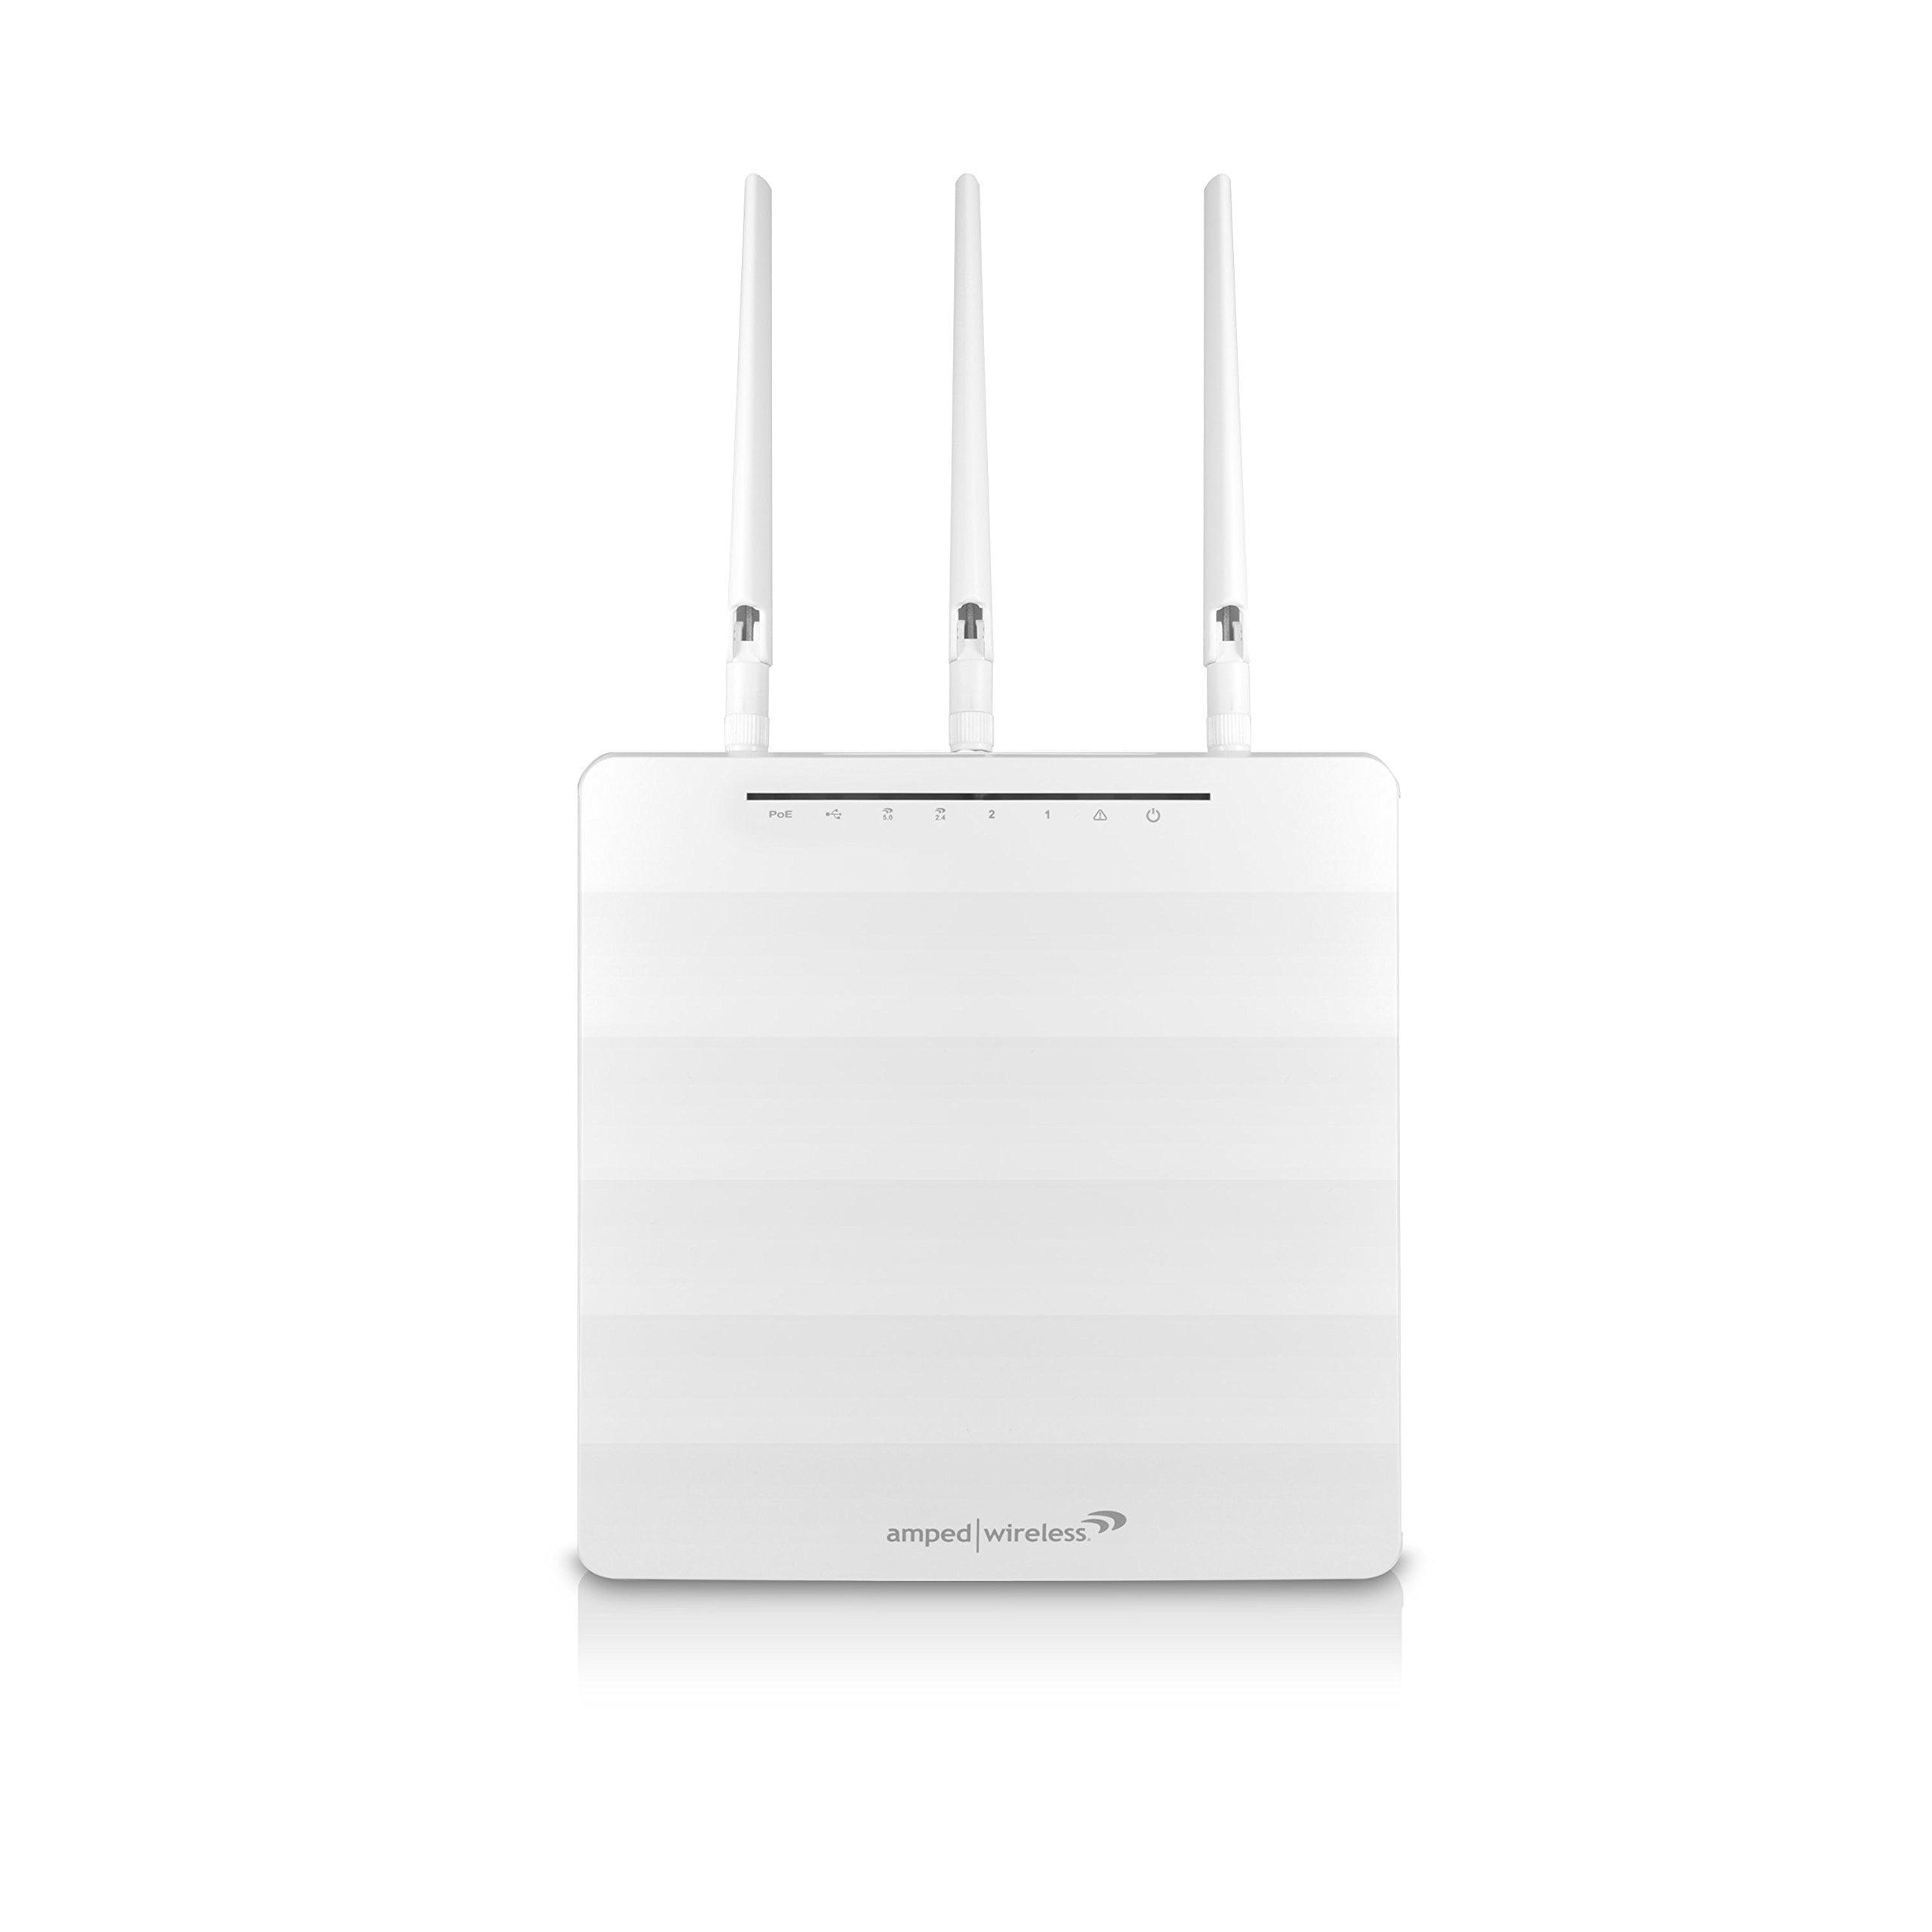 Ampedwireless Reb175p Ieee 802.11ac 1.71 Gbps Wireless Ra...